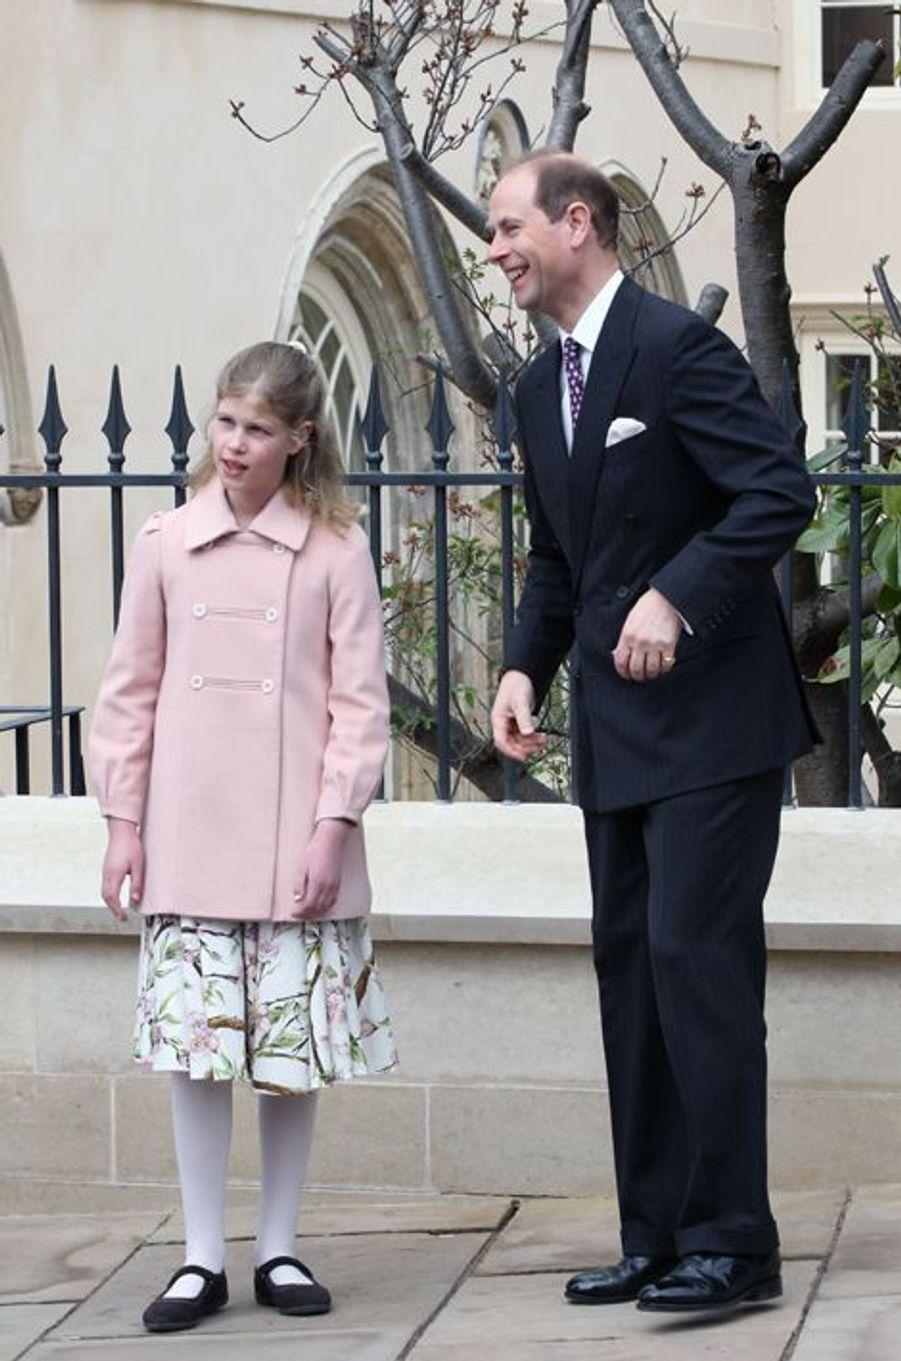 Le prince Andrew et sa fille Louise à Windsor, le 5 avril 2015